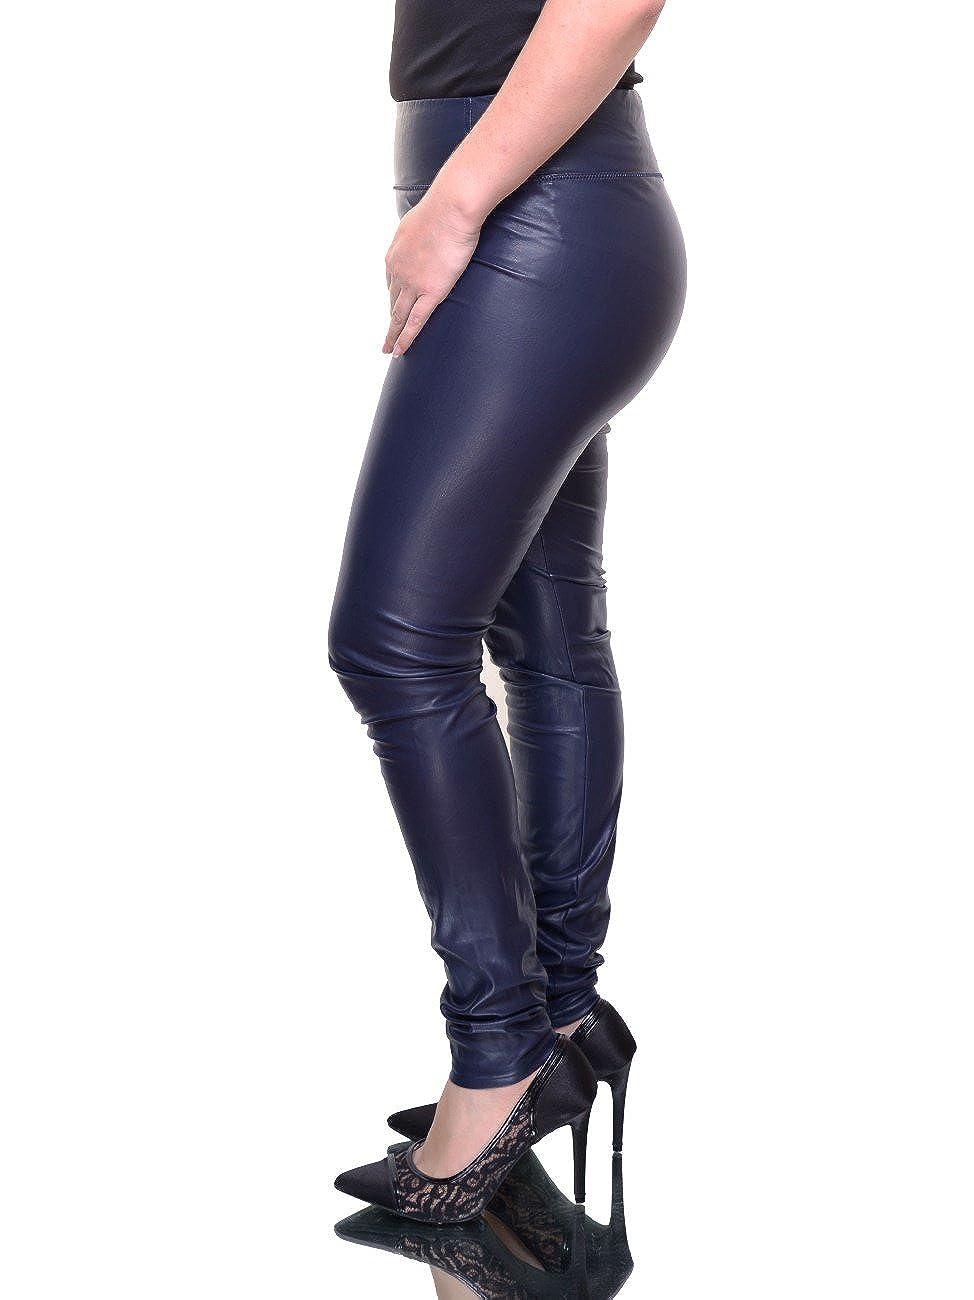 bf626409d98698 RALPH LAUREN Lauren Women's Alatea Faux Leather Leggings Pants, Navy Blue  at Amazon Women's Clothing store: